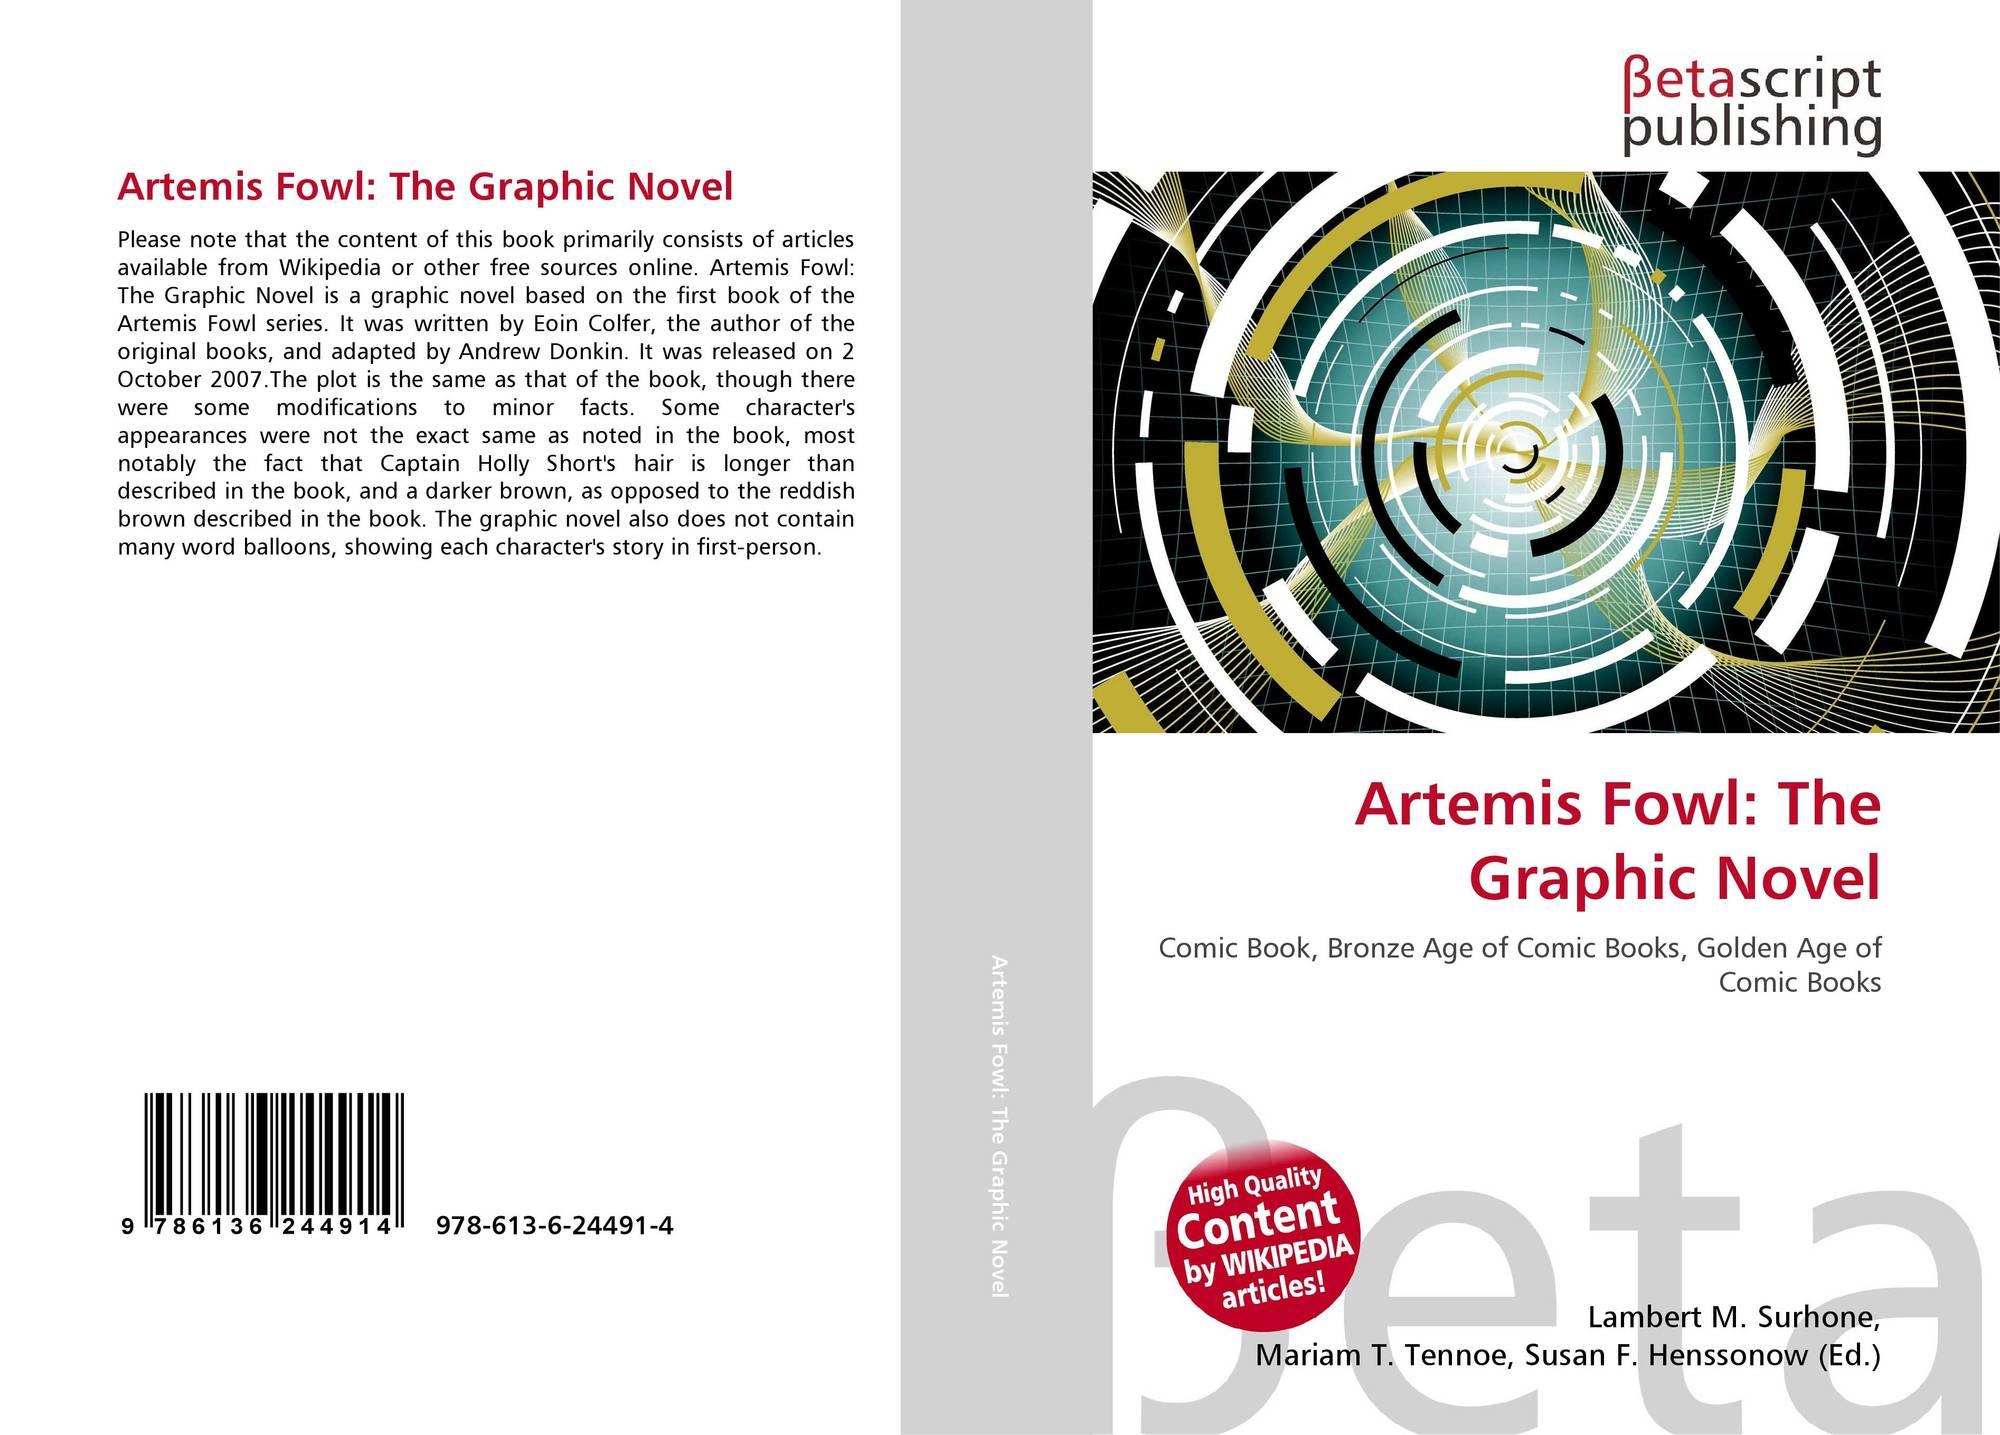 Artemis Fowl The Graphic Novel 978 613 6 24491 4